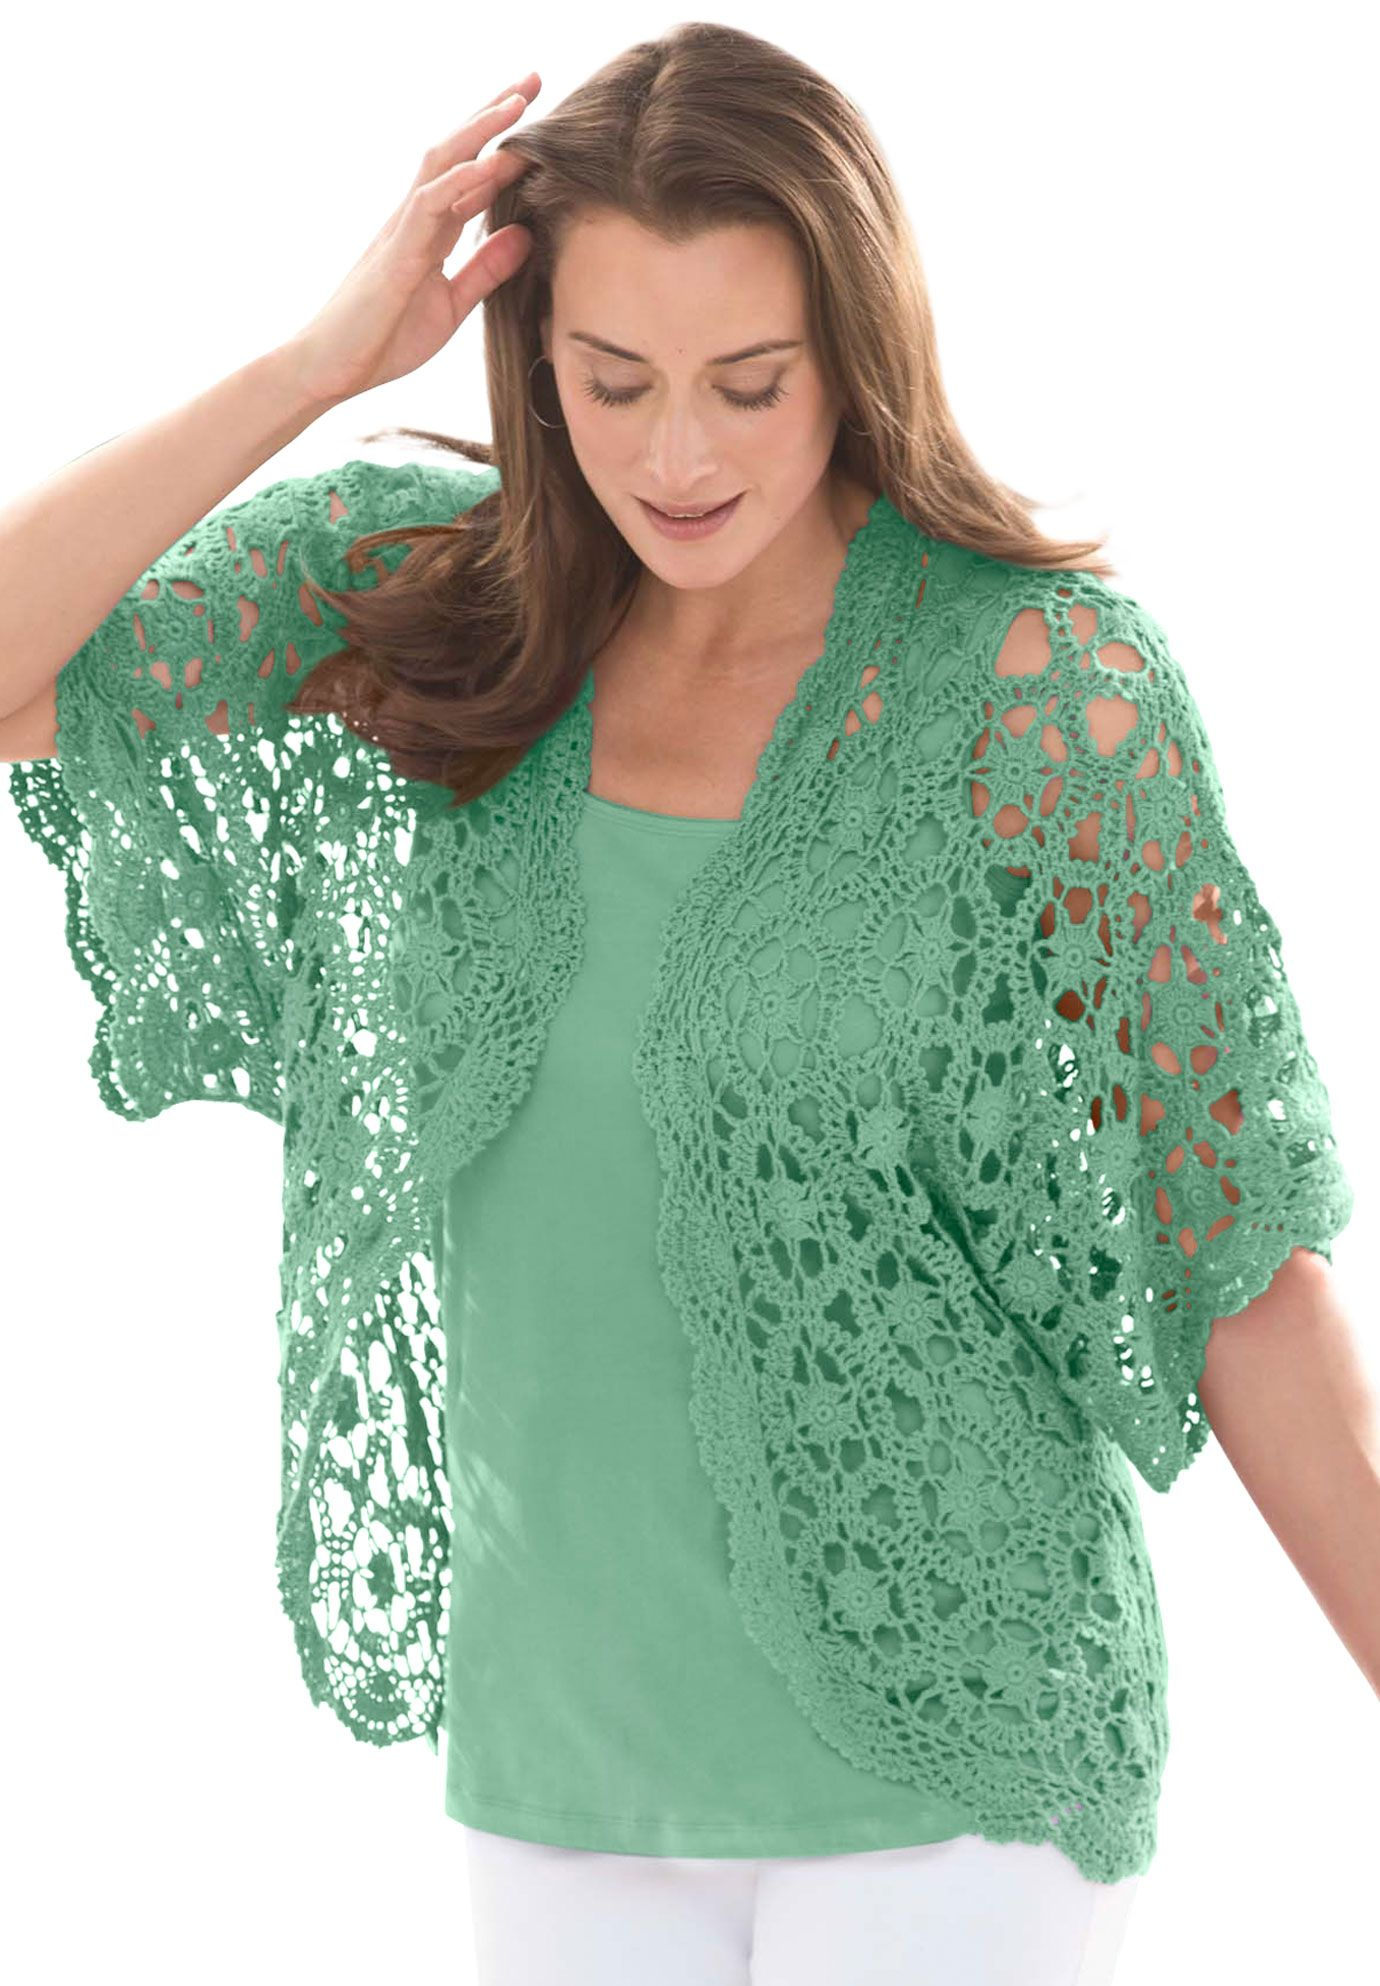 Shrug Cardigan In Crochet Plus Size Shrugs Jessica London